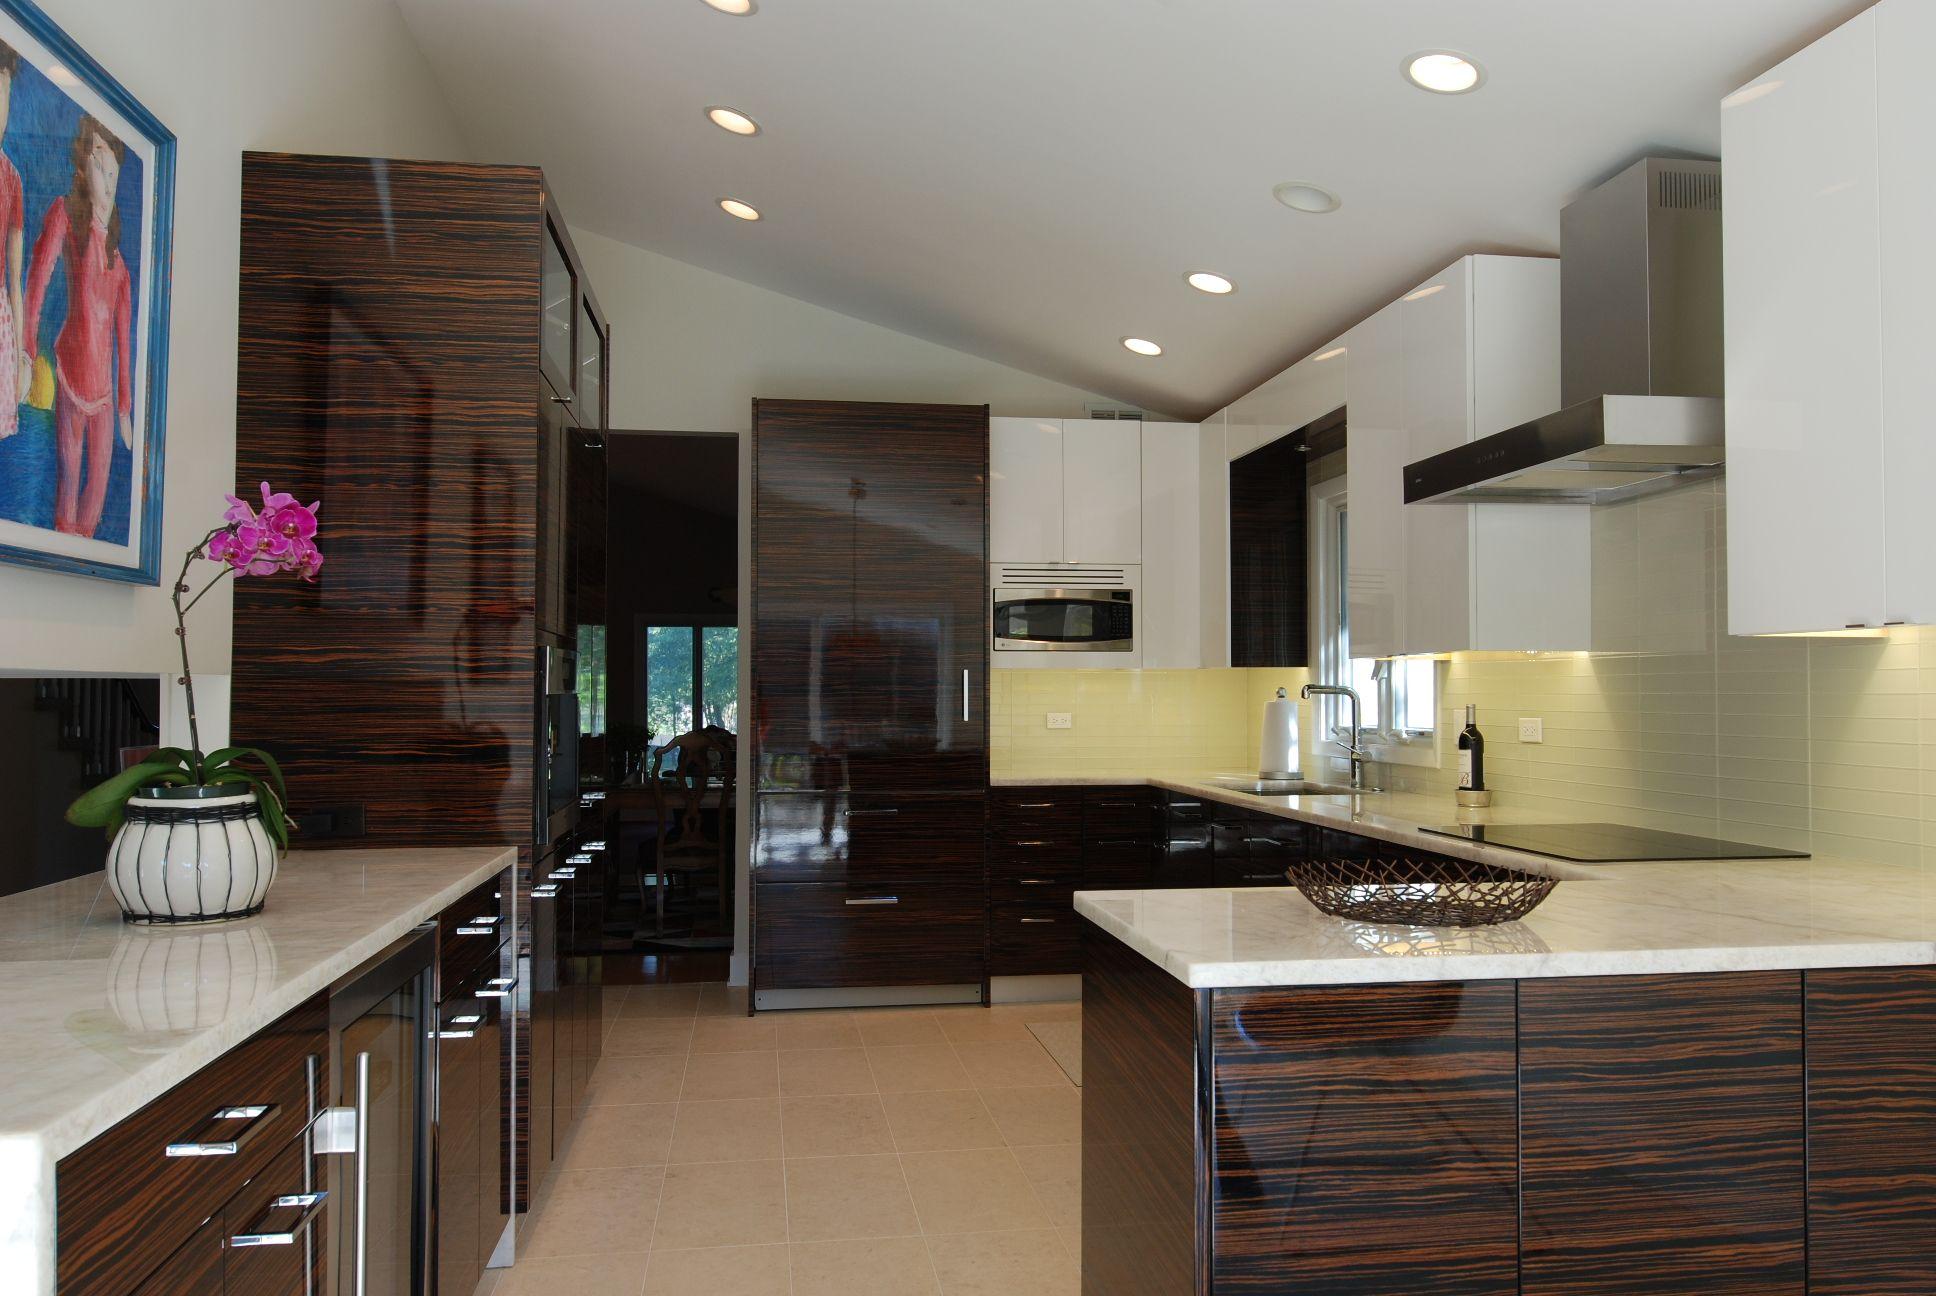 Pin By John Salazar On Nye Mobler Kitchen Design Kitchen Decor Wood Kitchen Cabinets